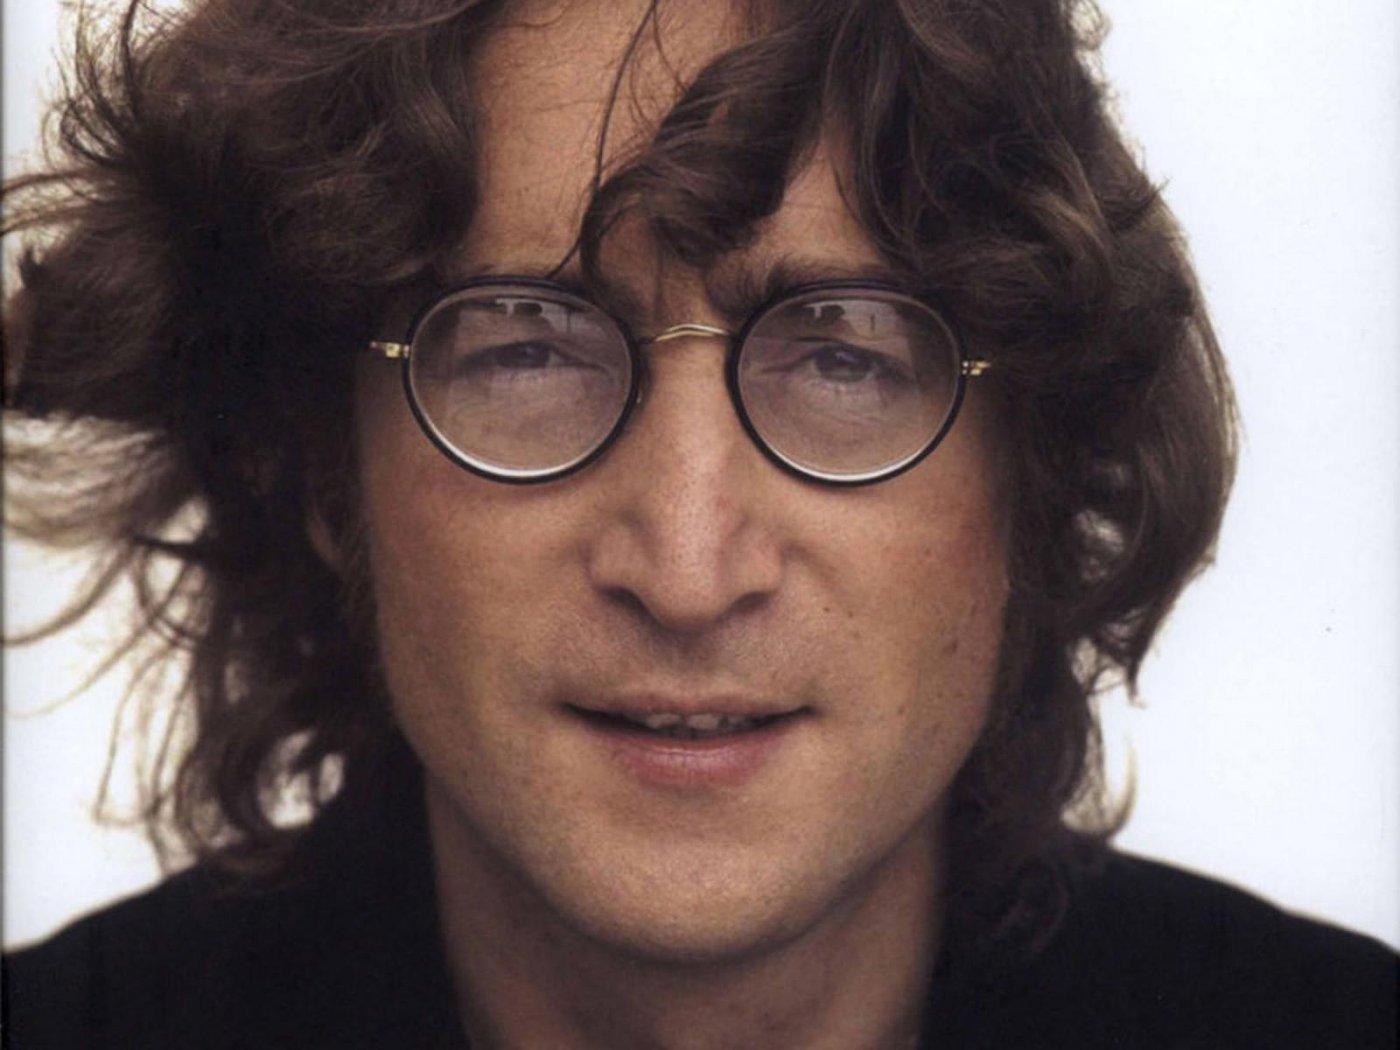 Yoko-Ono-rivelazione-choc-John-Lennon-era-bisessuale